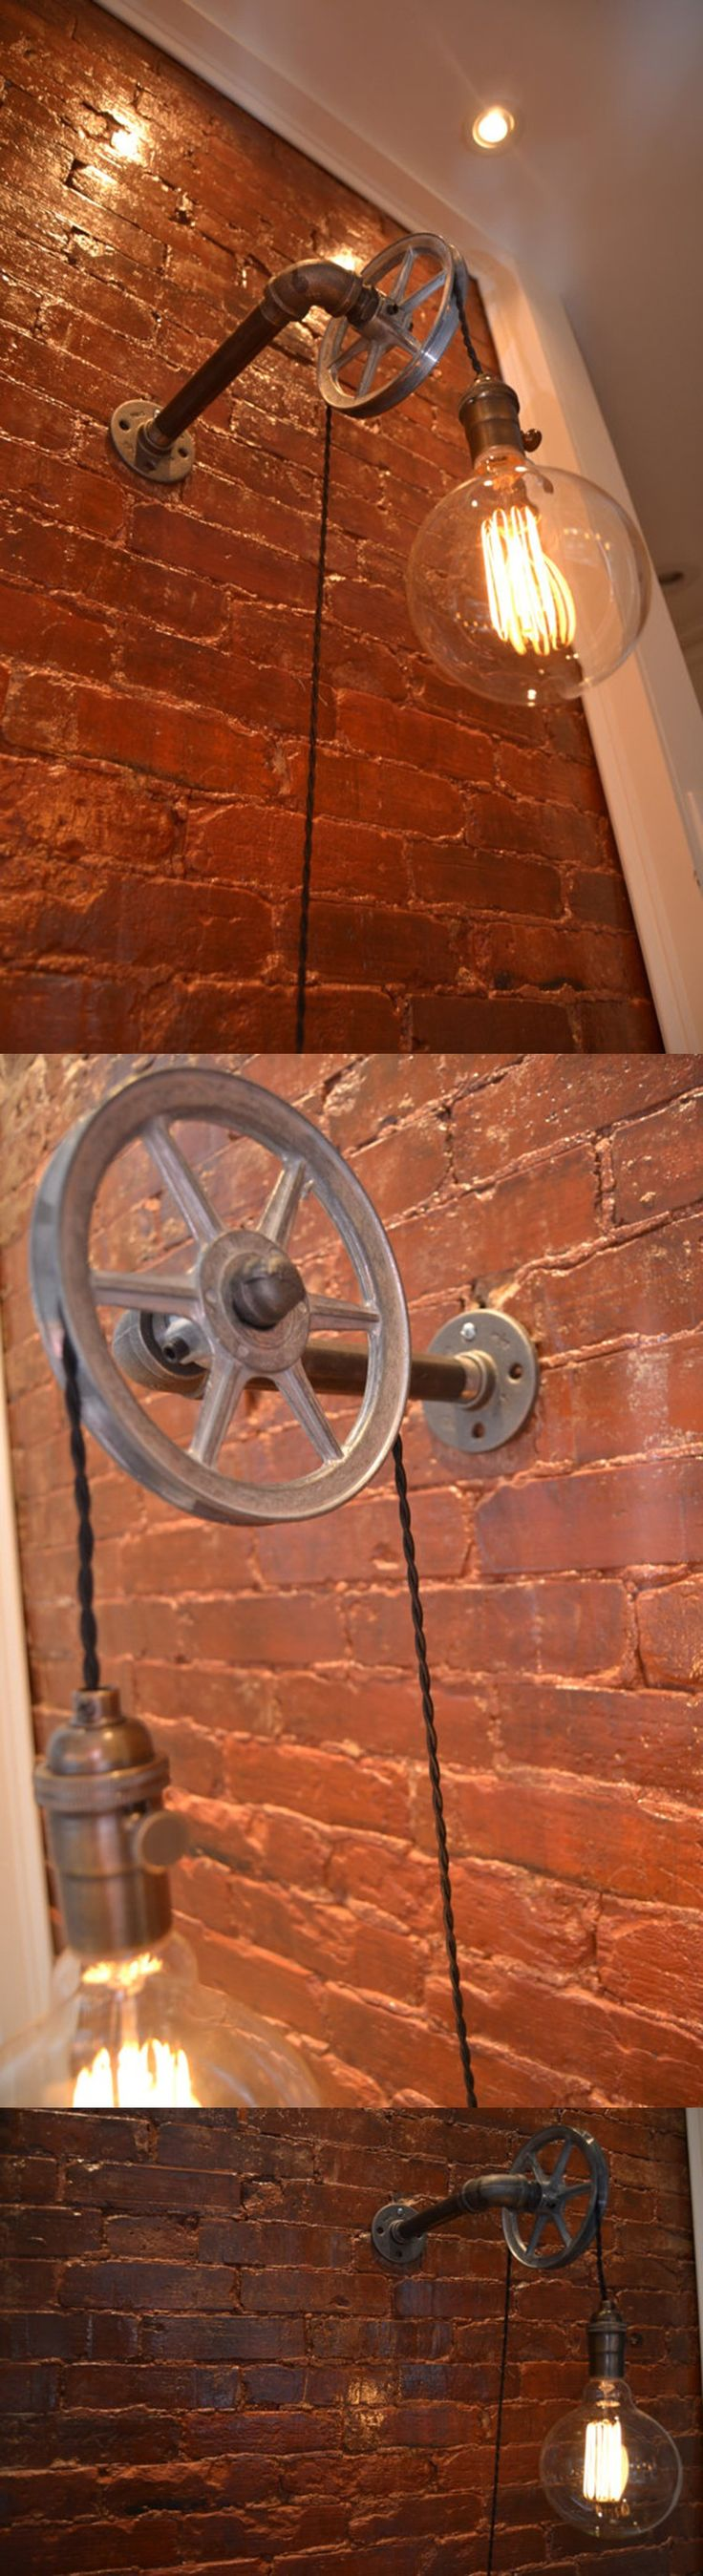 best 25+ vintage wall lights ideas on pinterest | industrial wall